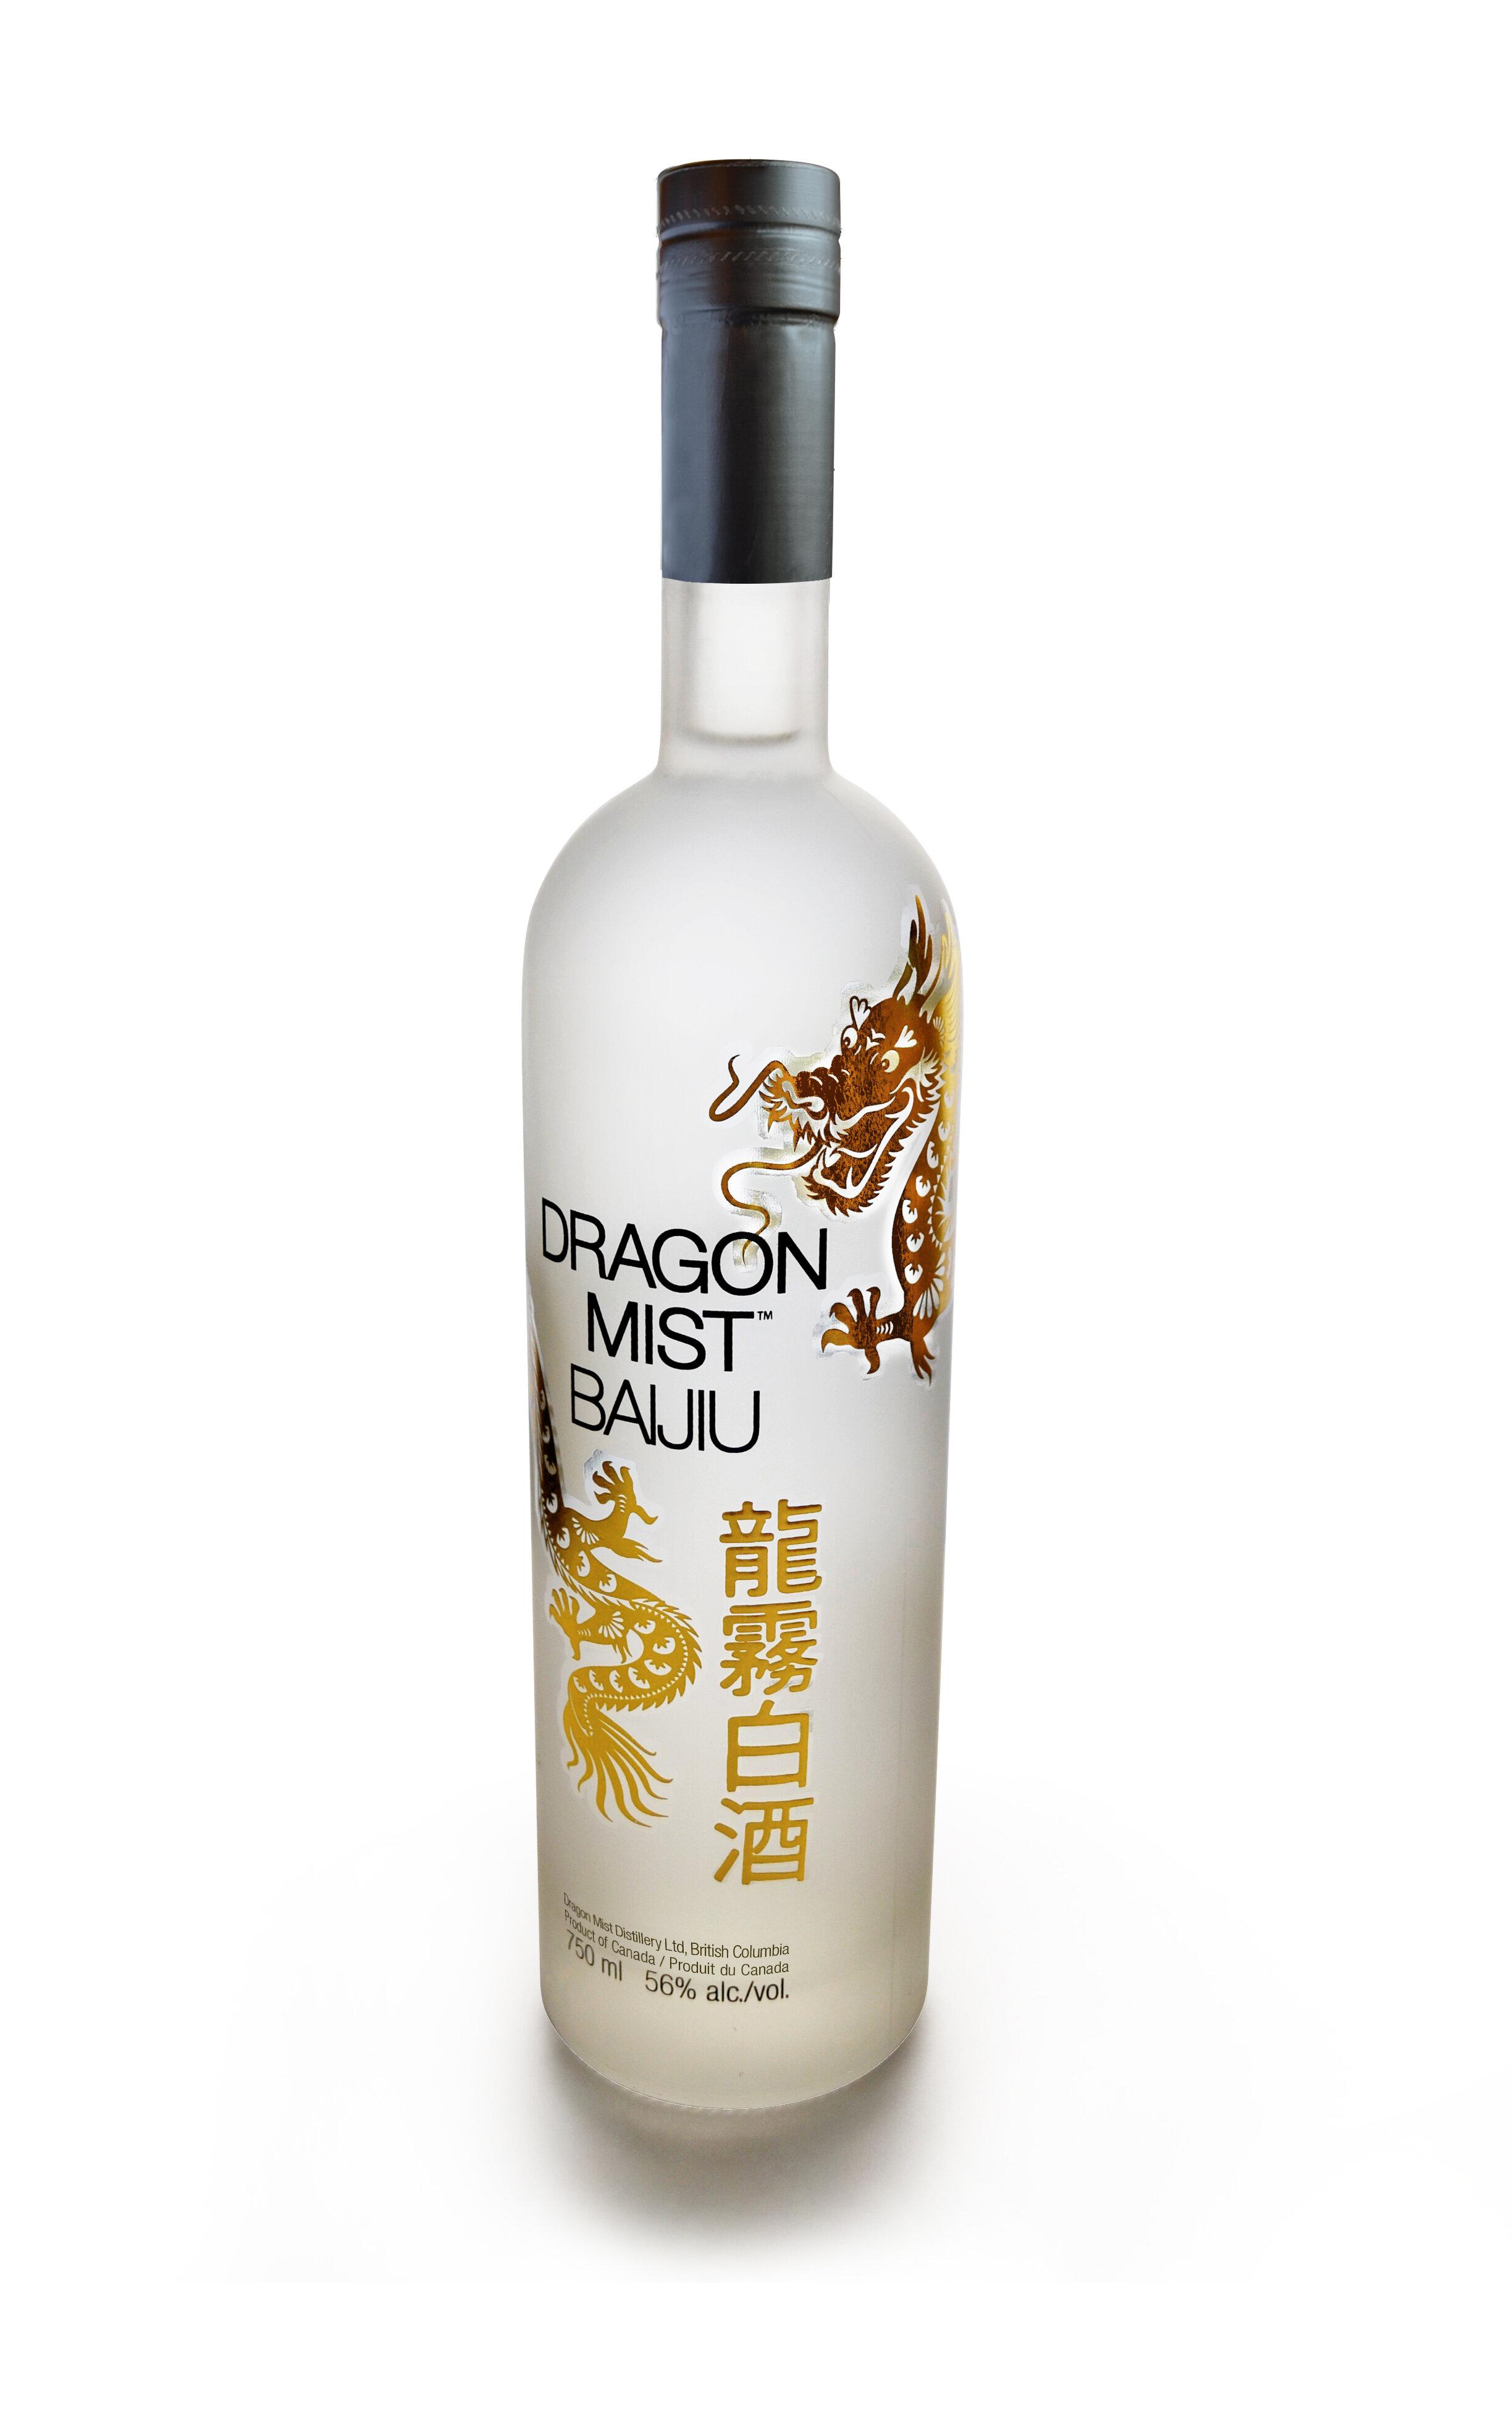 Image courtesy of Dragon Mist Distillery